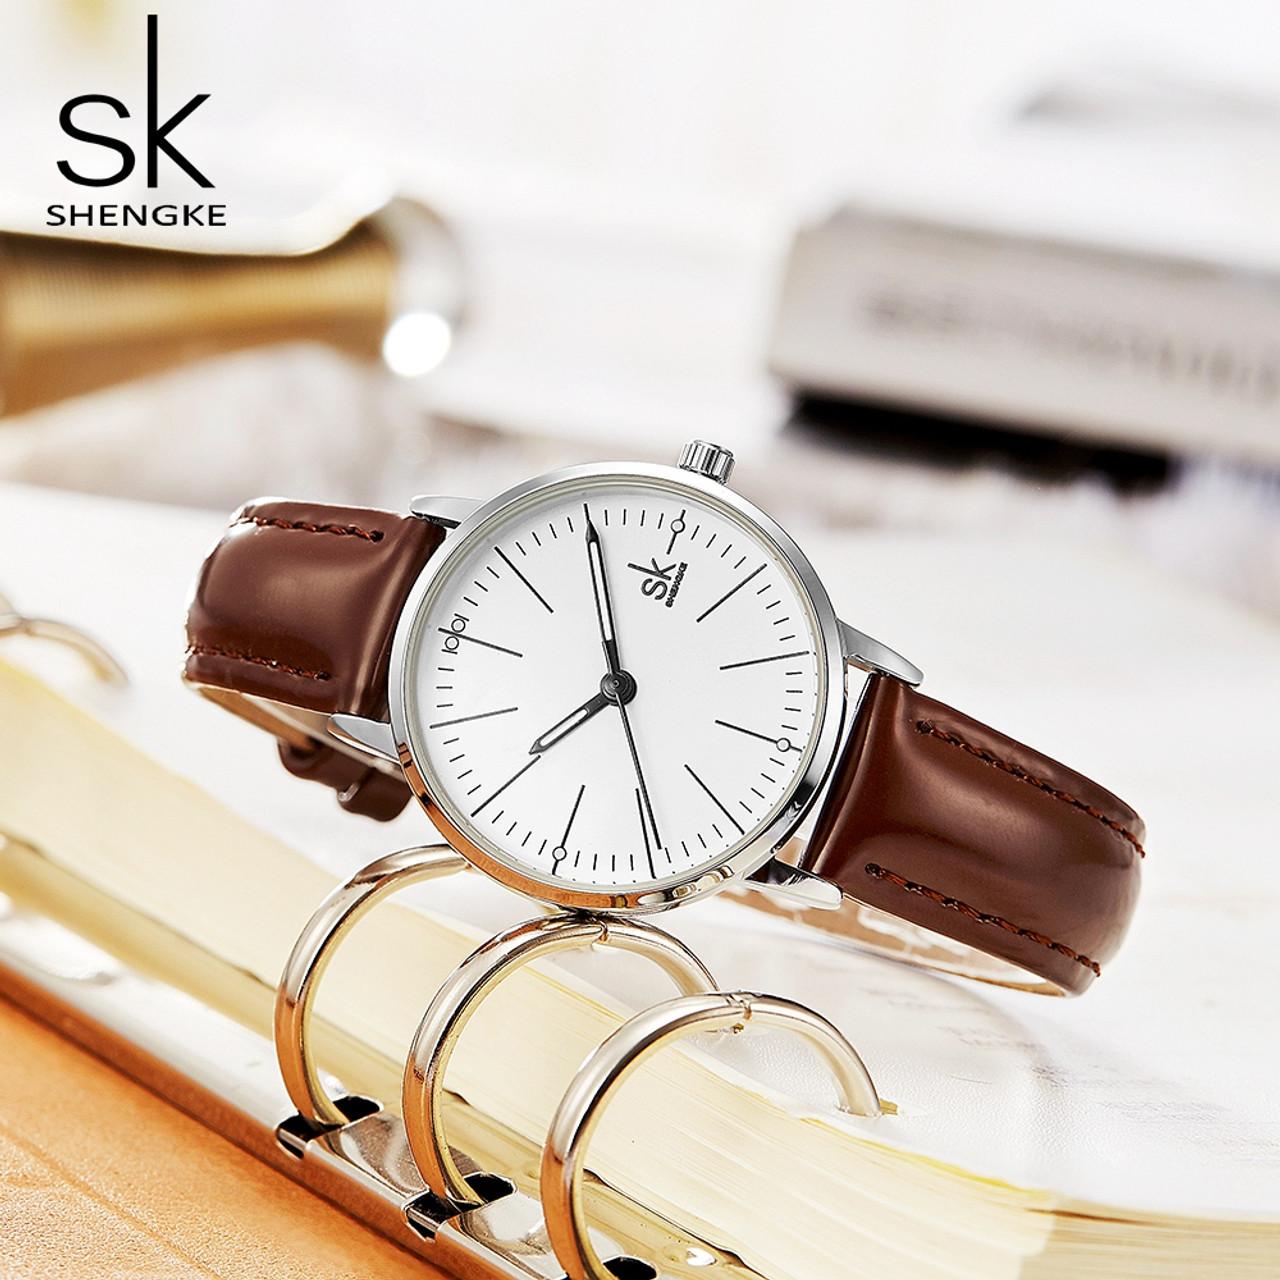 0ade4006d158 ... SK New Couple Watch Men Women Watches Simple Quartz Reloj High Quality  Relogio Masculino Business Clock ...